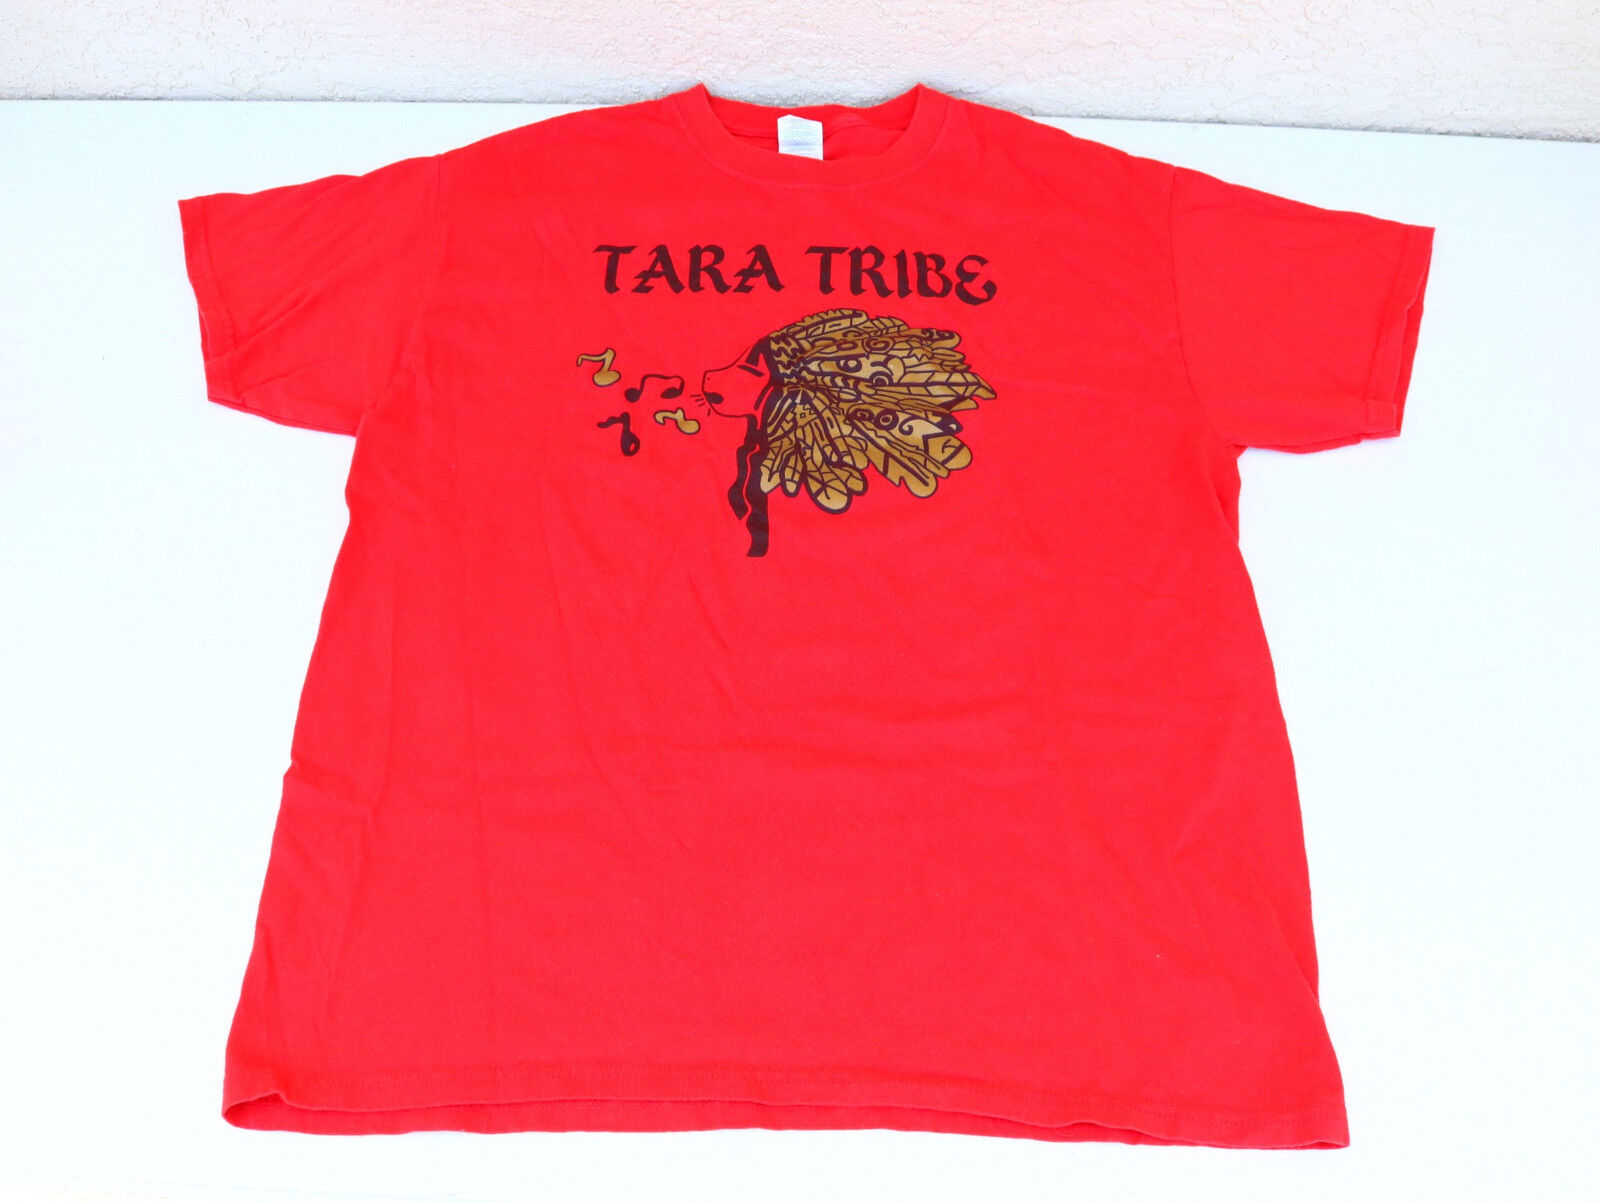 US Women ART Music Red T Shirt TARA TRIBE size L Indigenous Girl Music Whistle